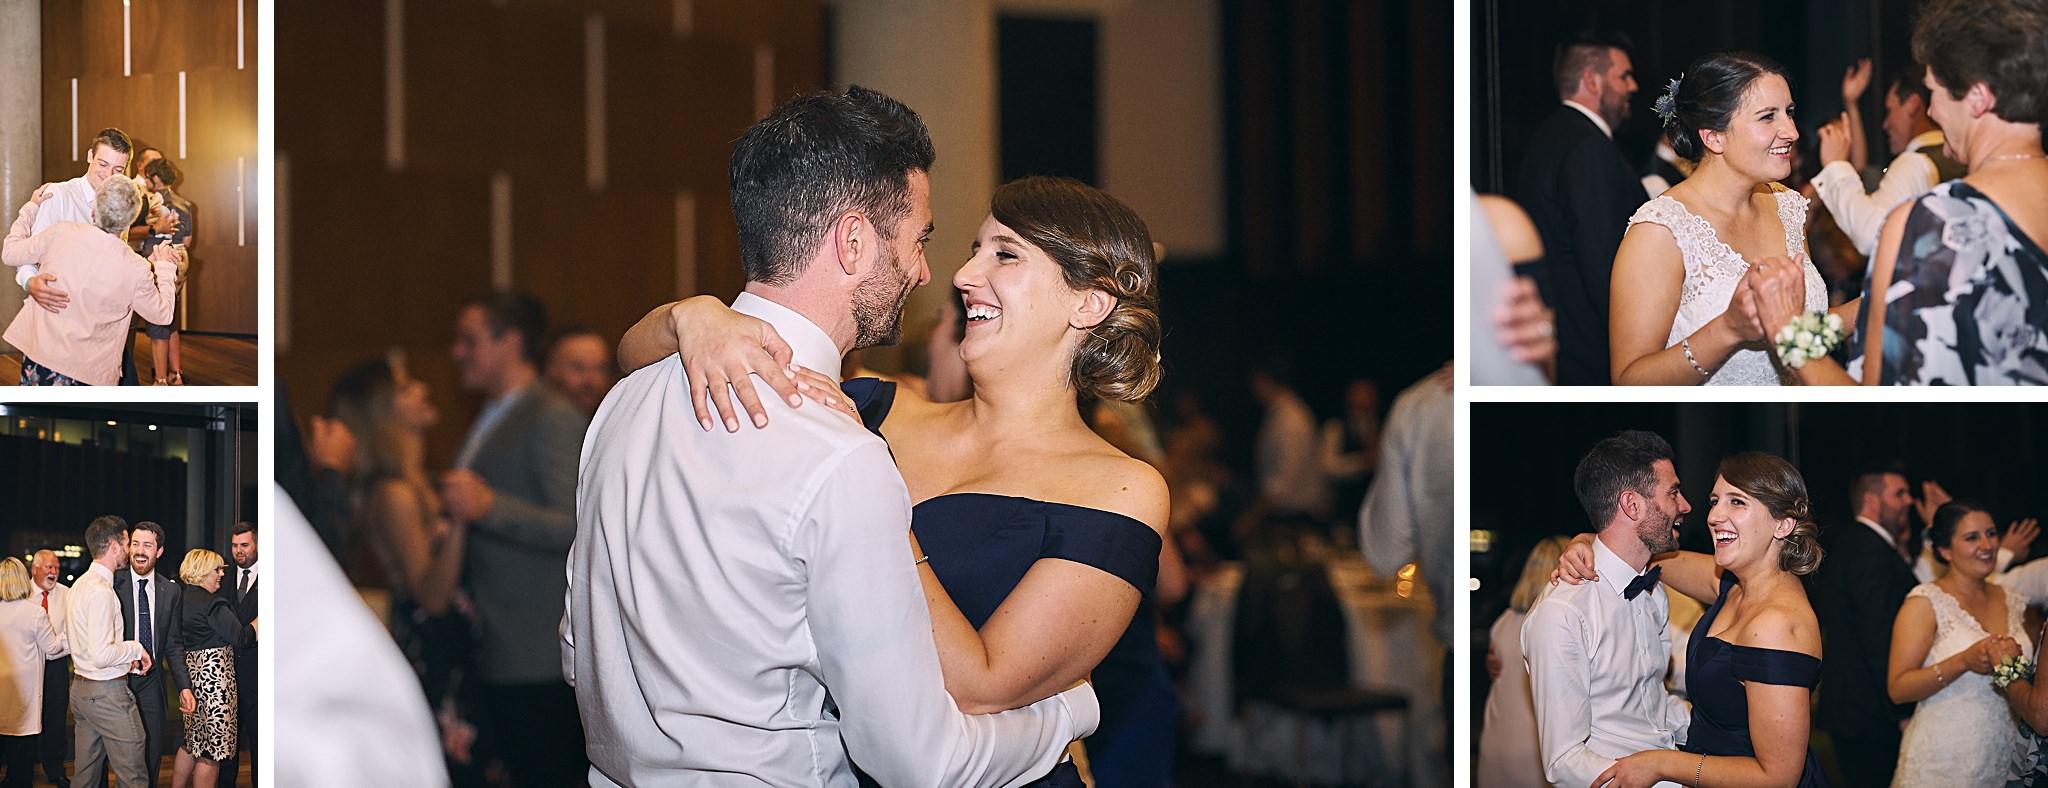 Adelaide_oval_wedding_0011.jpg